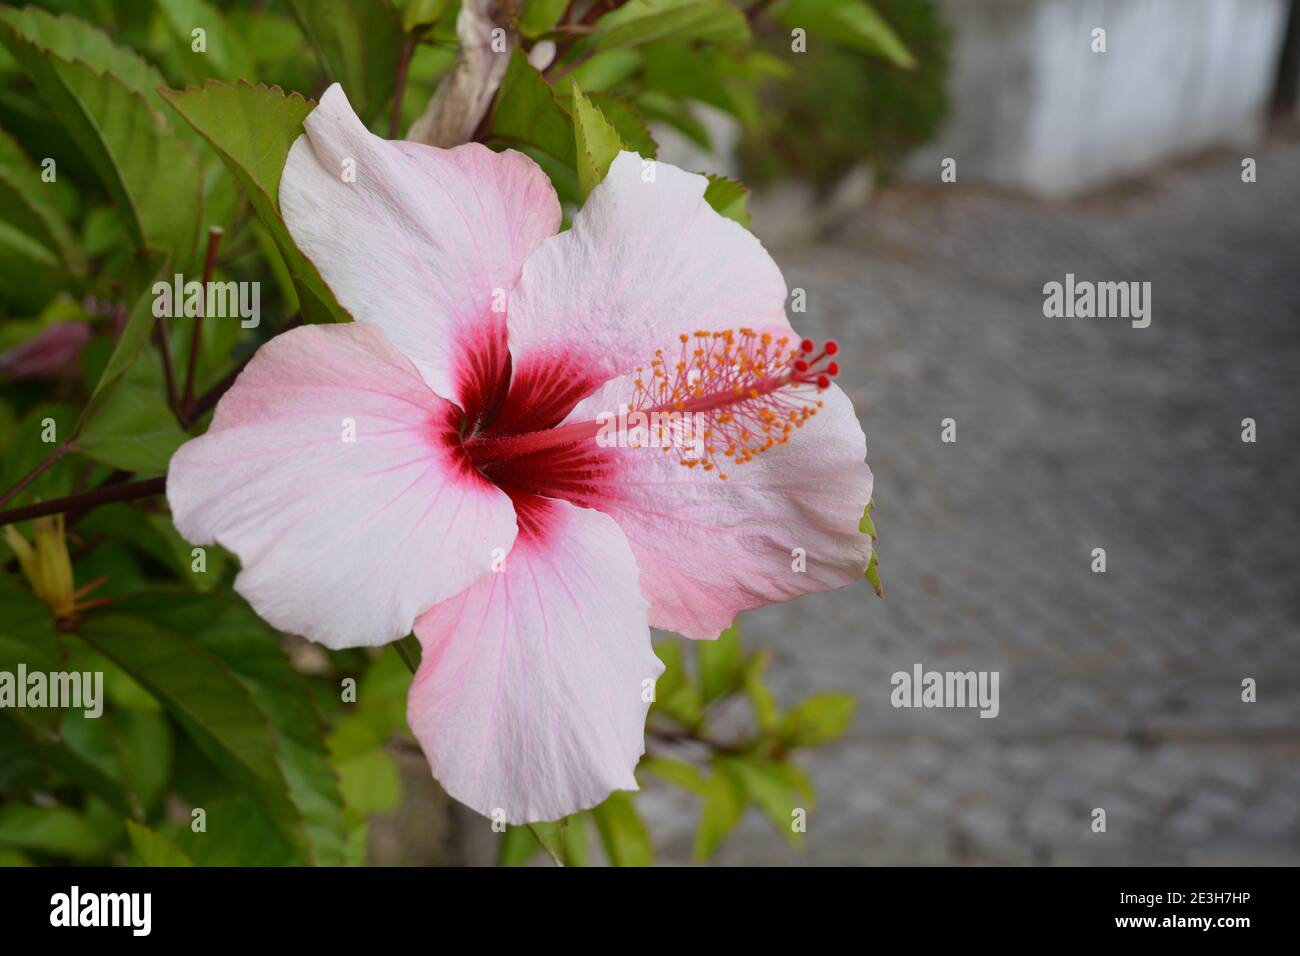 Hibiscus flor en flor Foto de stock